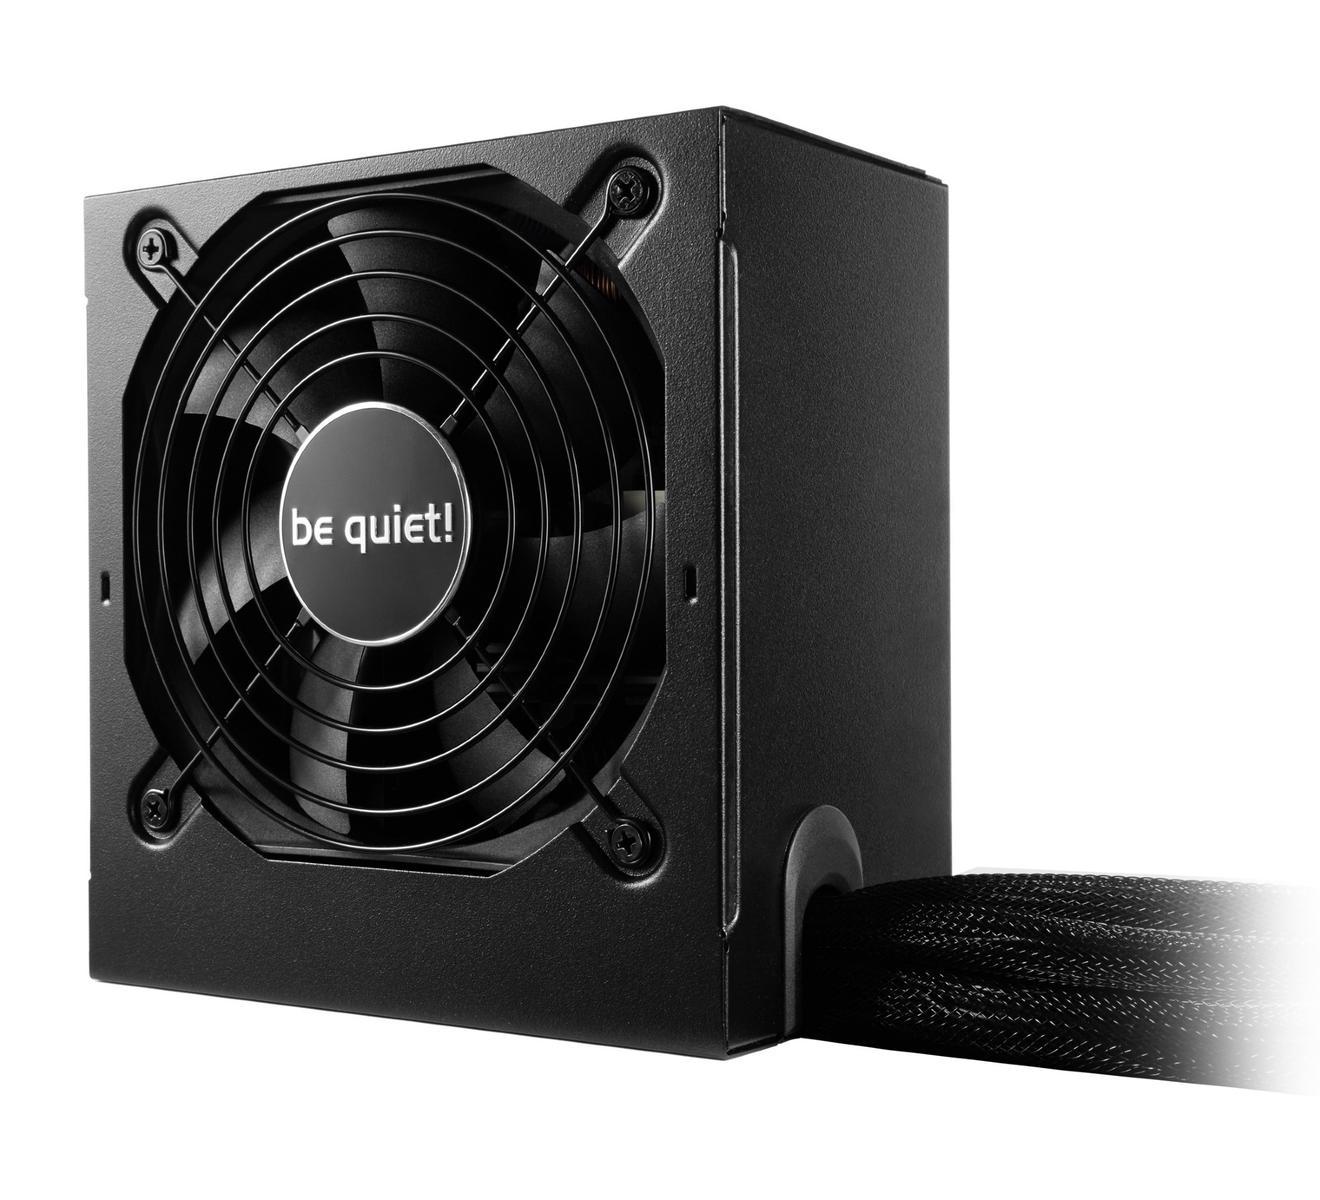 be quiet! System Power 9 500 W 80+ Bronze Certified ATX Power Supply